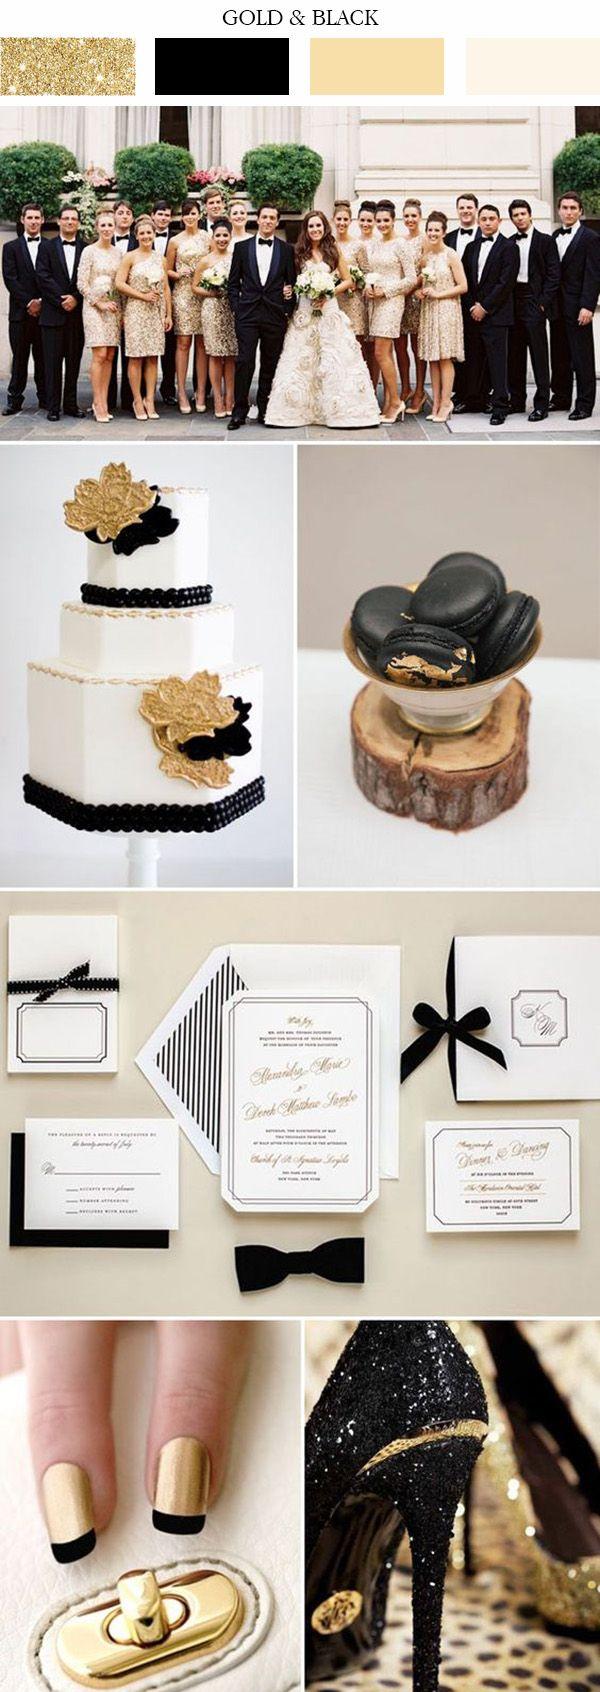 Wedding decorations black and gold   best Gold Wedding images on Pinterest  Weddings Wedding